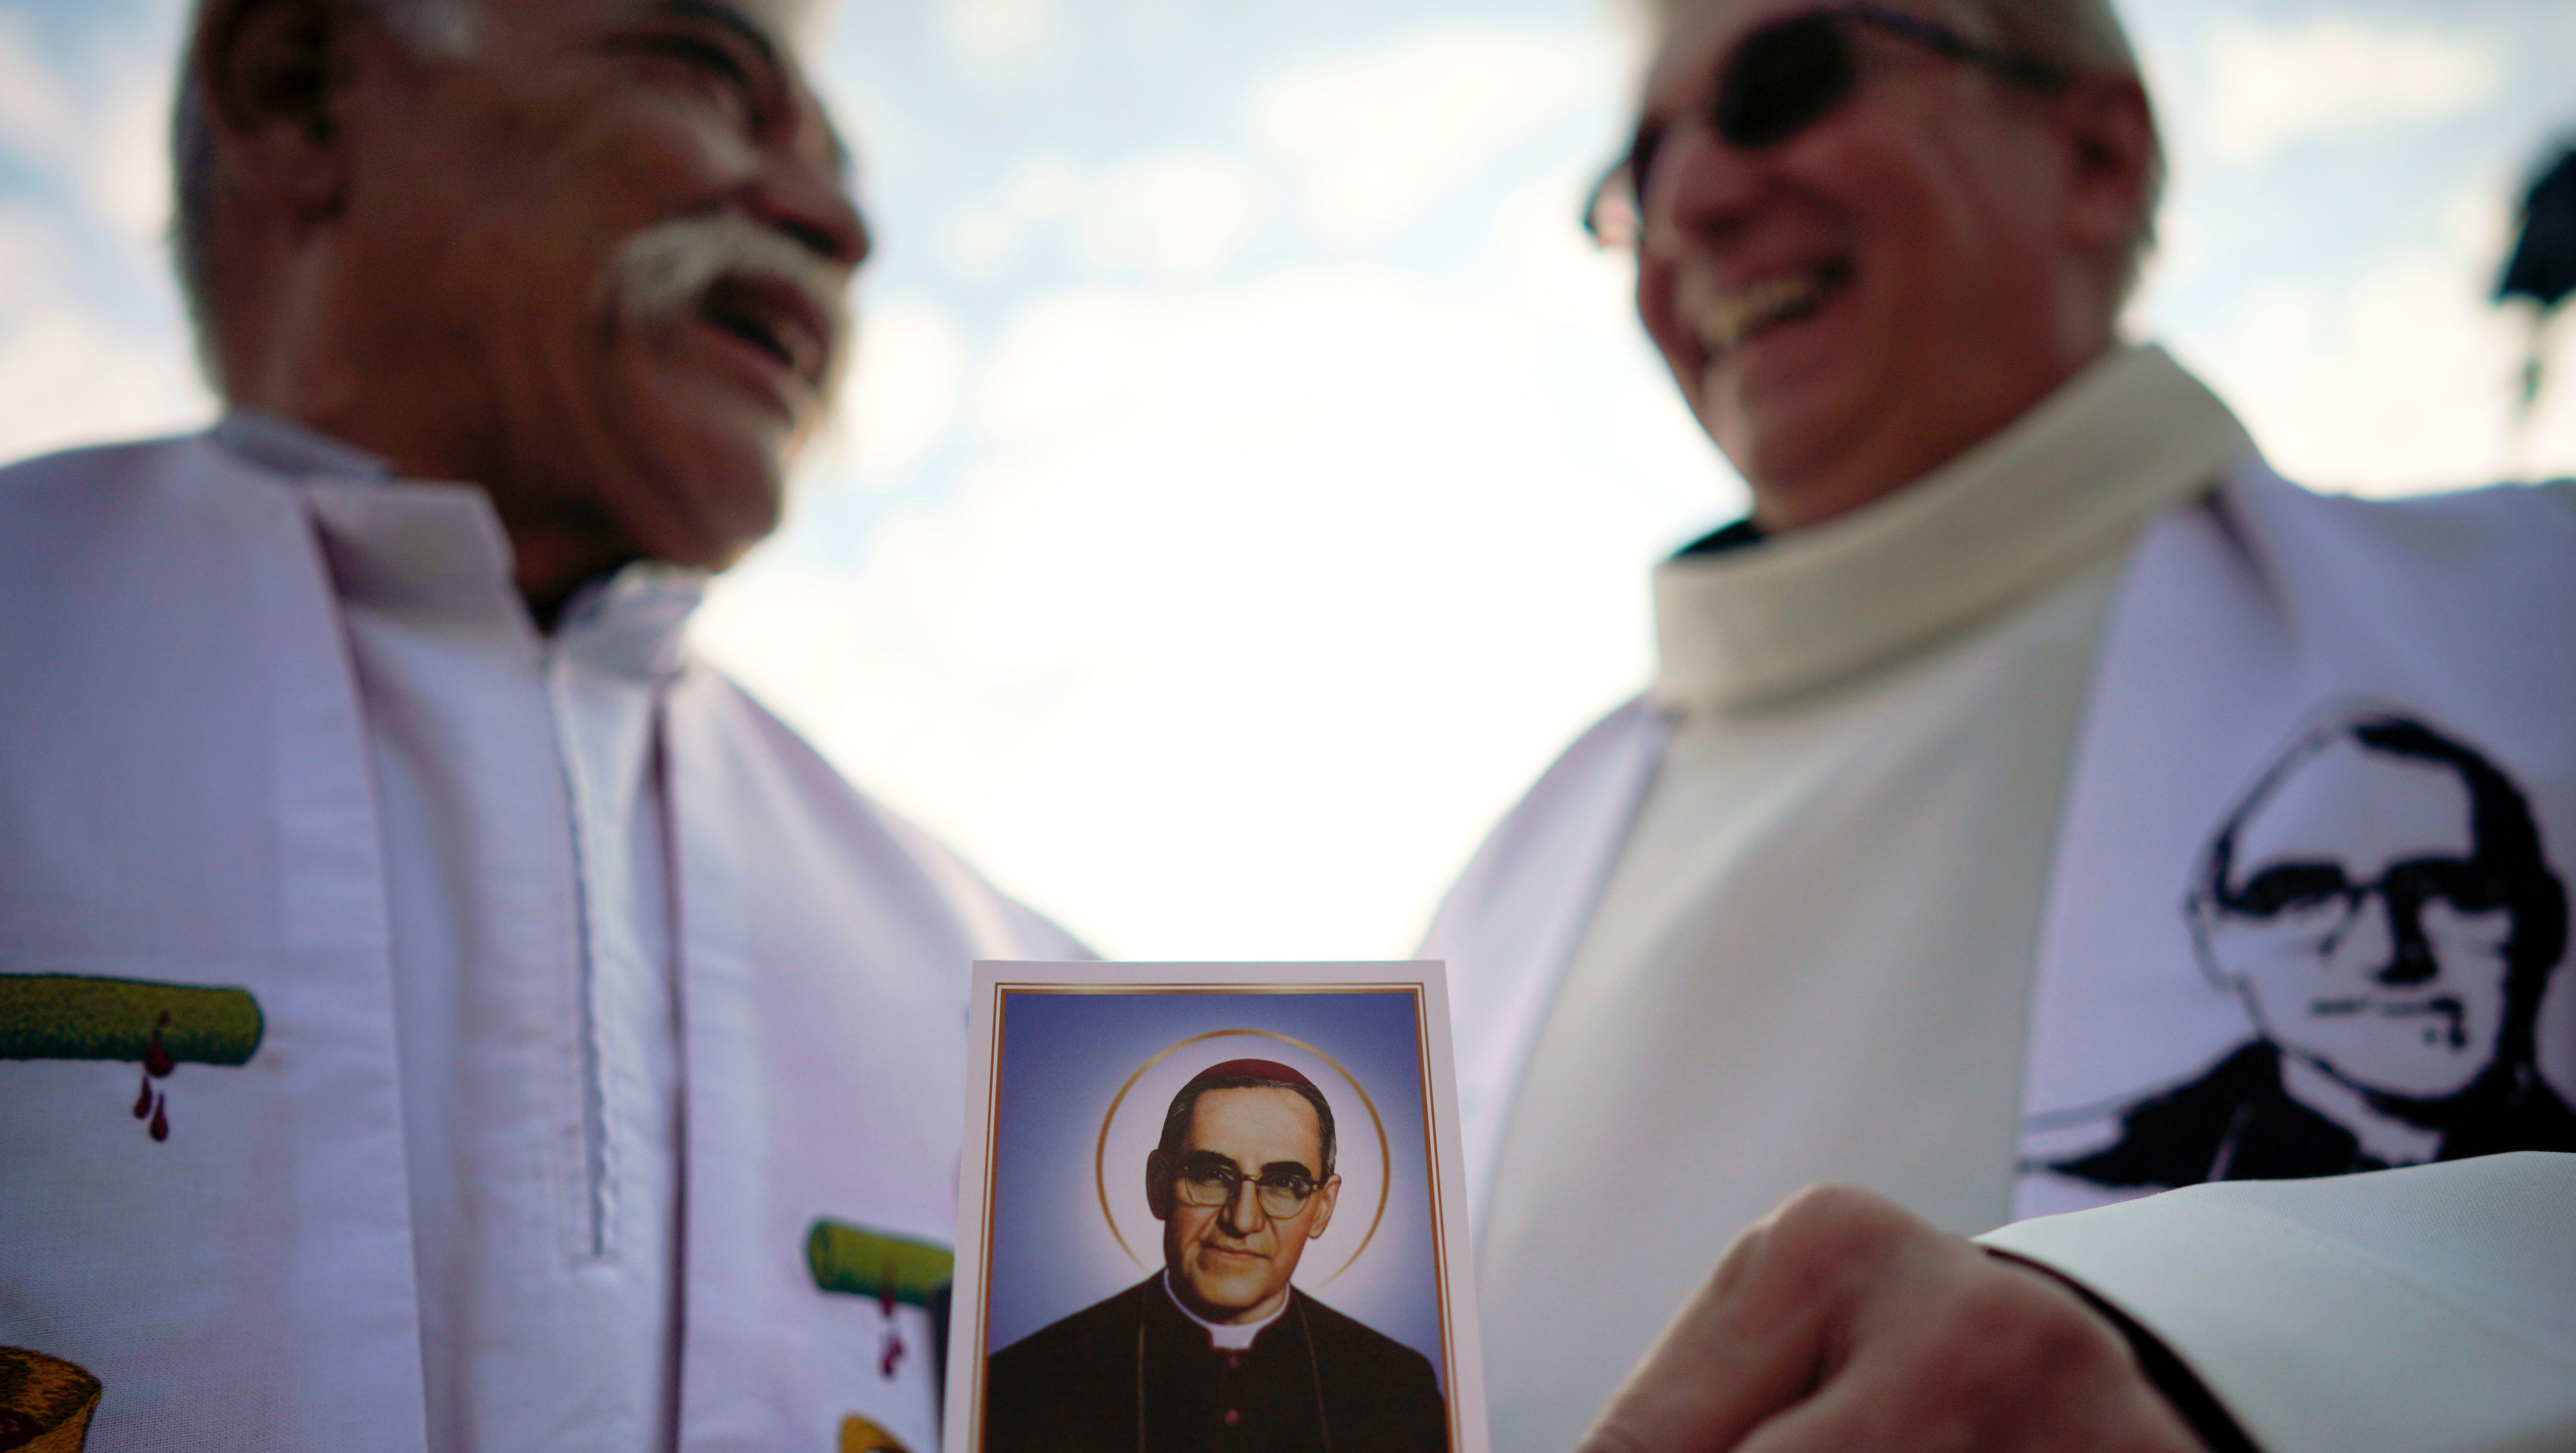 pope francis names new saints bishop oscar romero pope paul vi